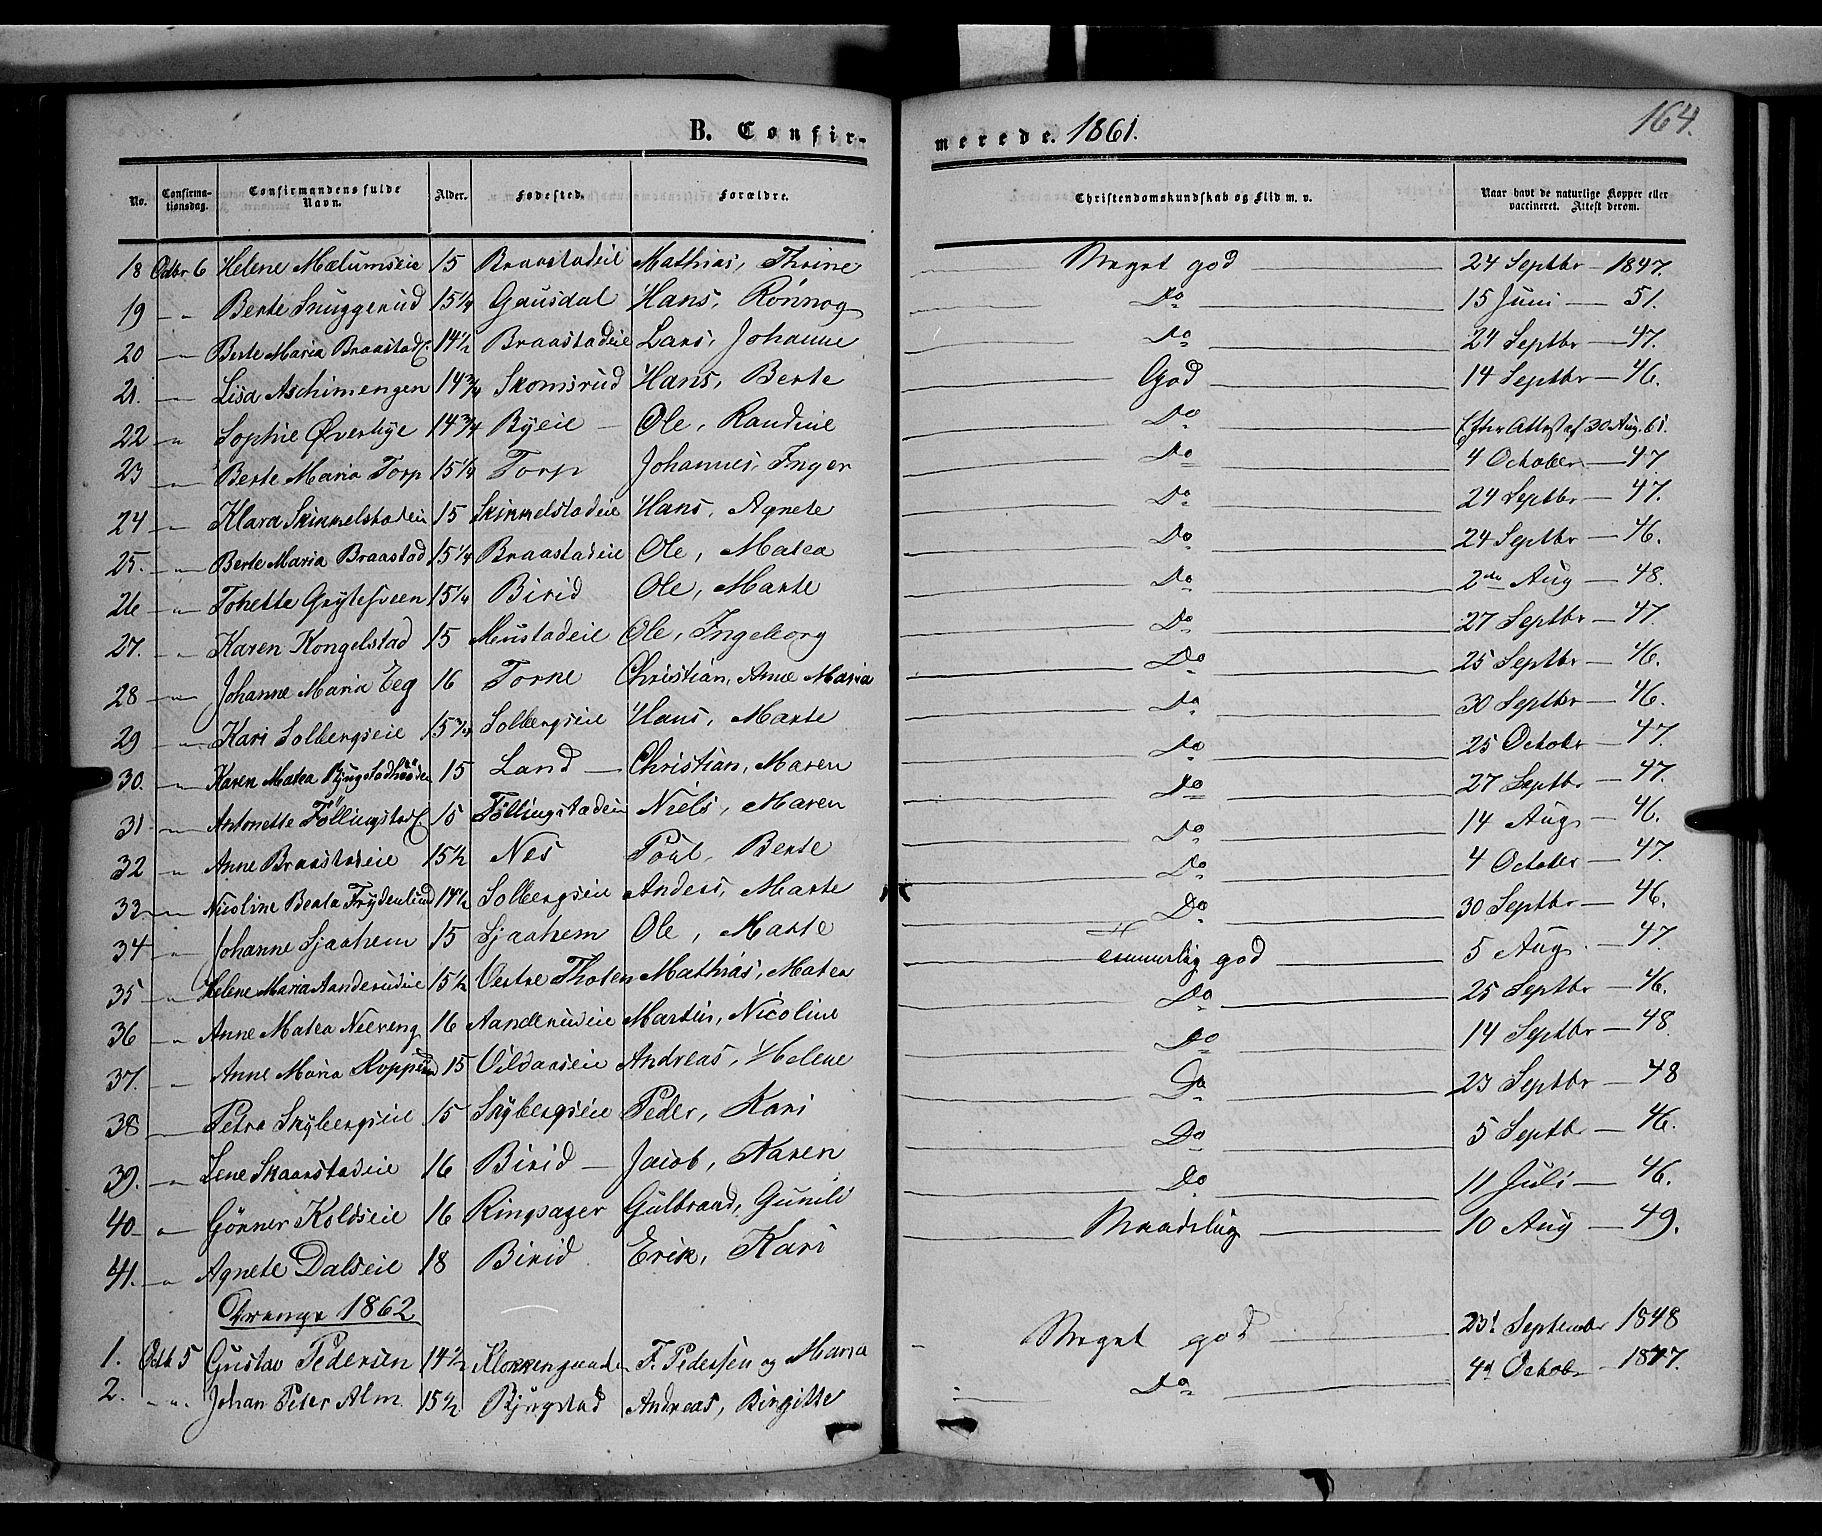 SAH, Vardal prestekontor, H/Ha/Haa/L0006: Ministerialbok nr. 6, 1854-1866, s. 164